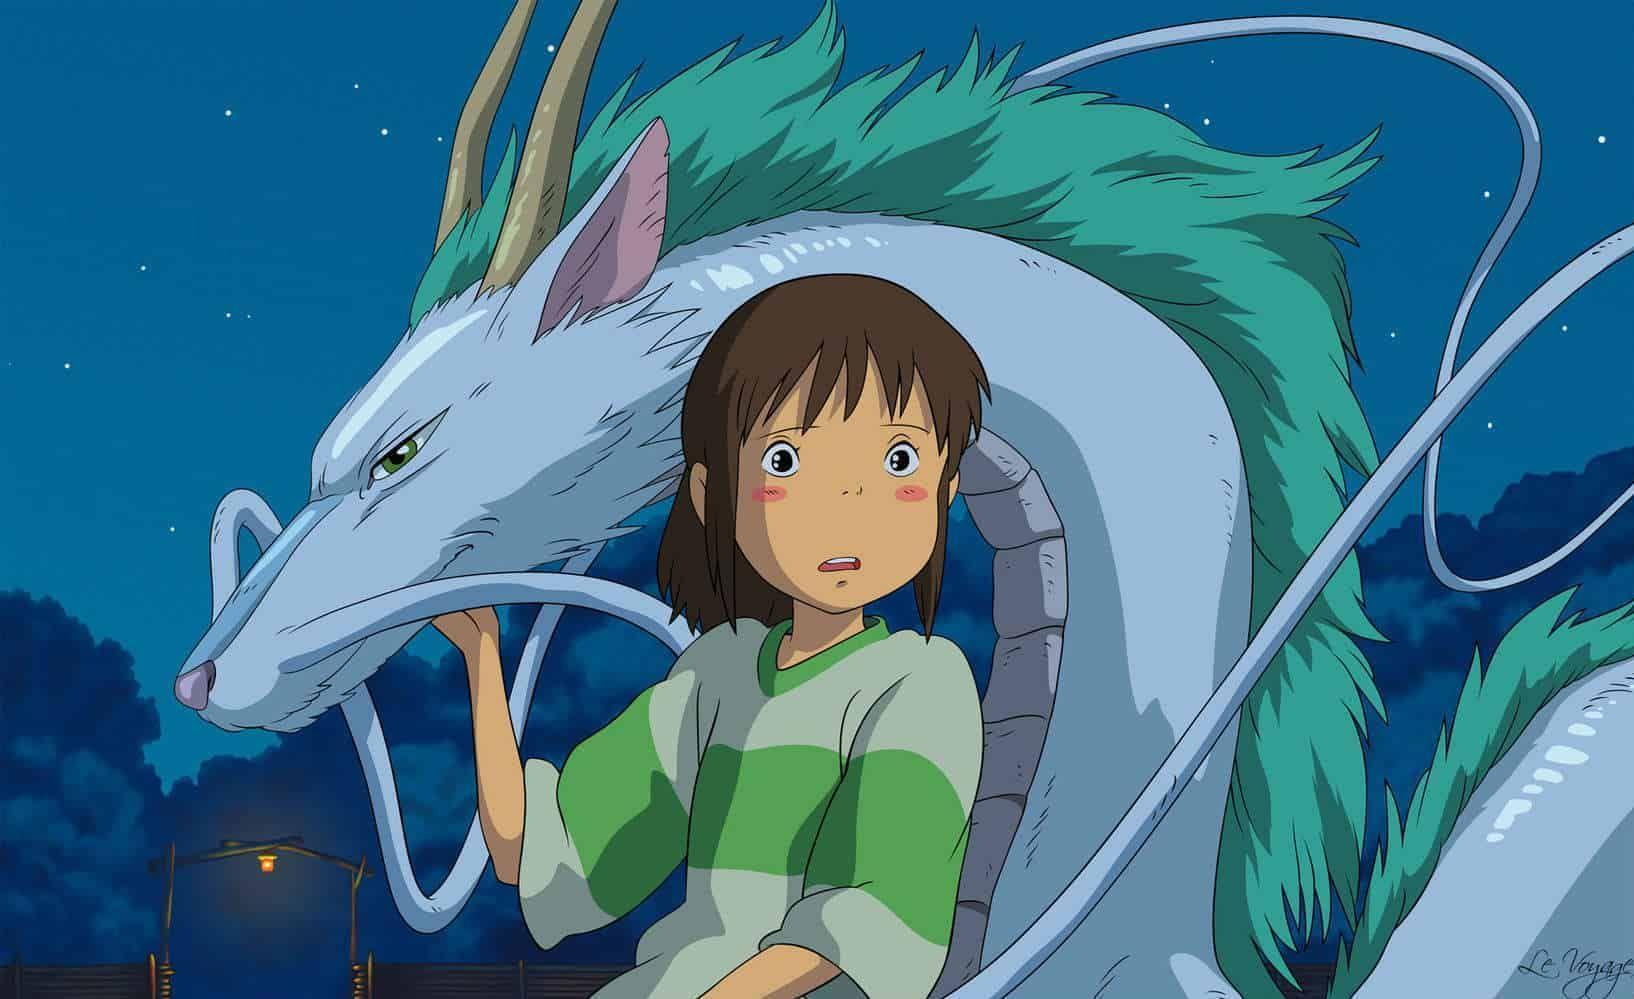 Netflix To Stream 21 Studio Ghibli Films Globally Next Month